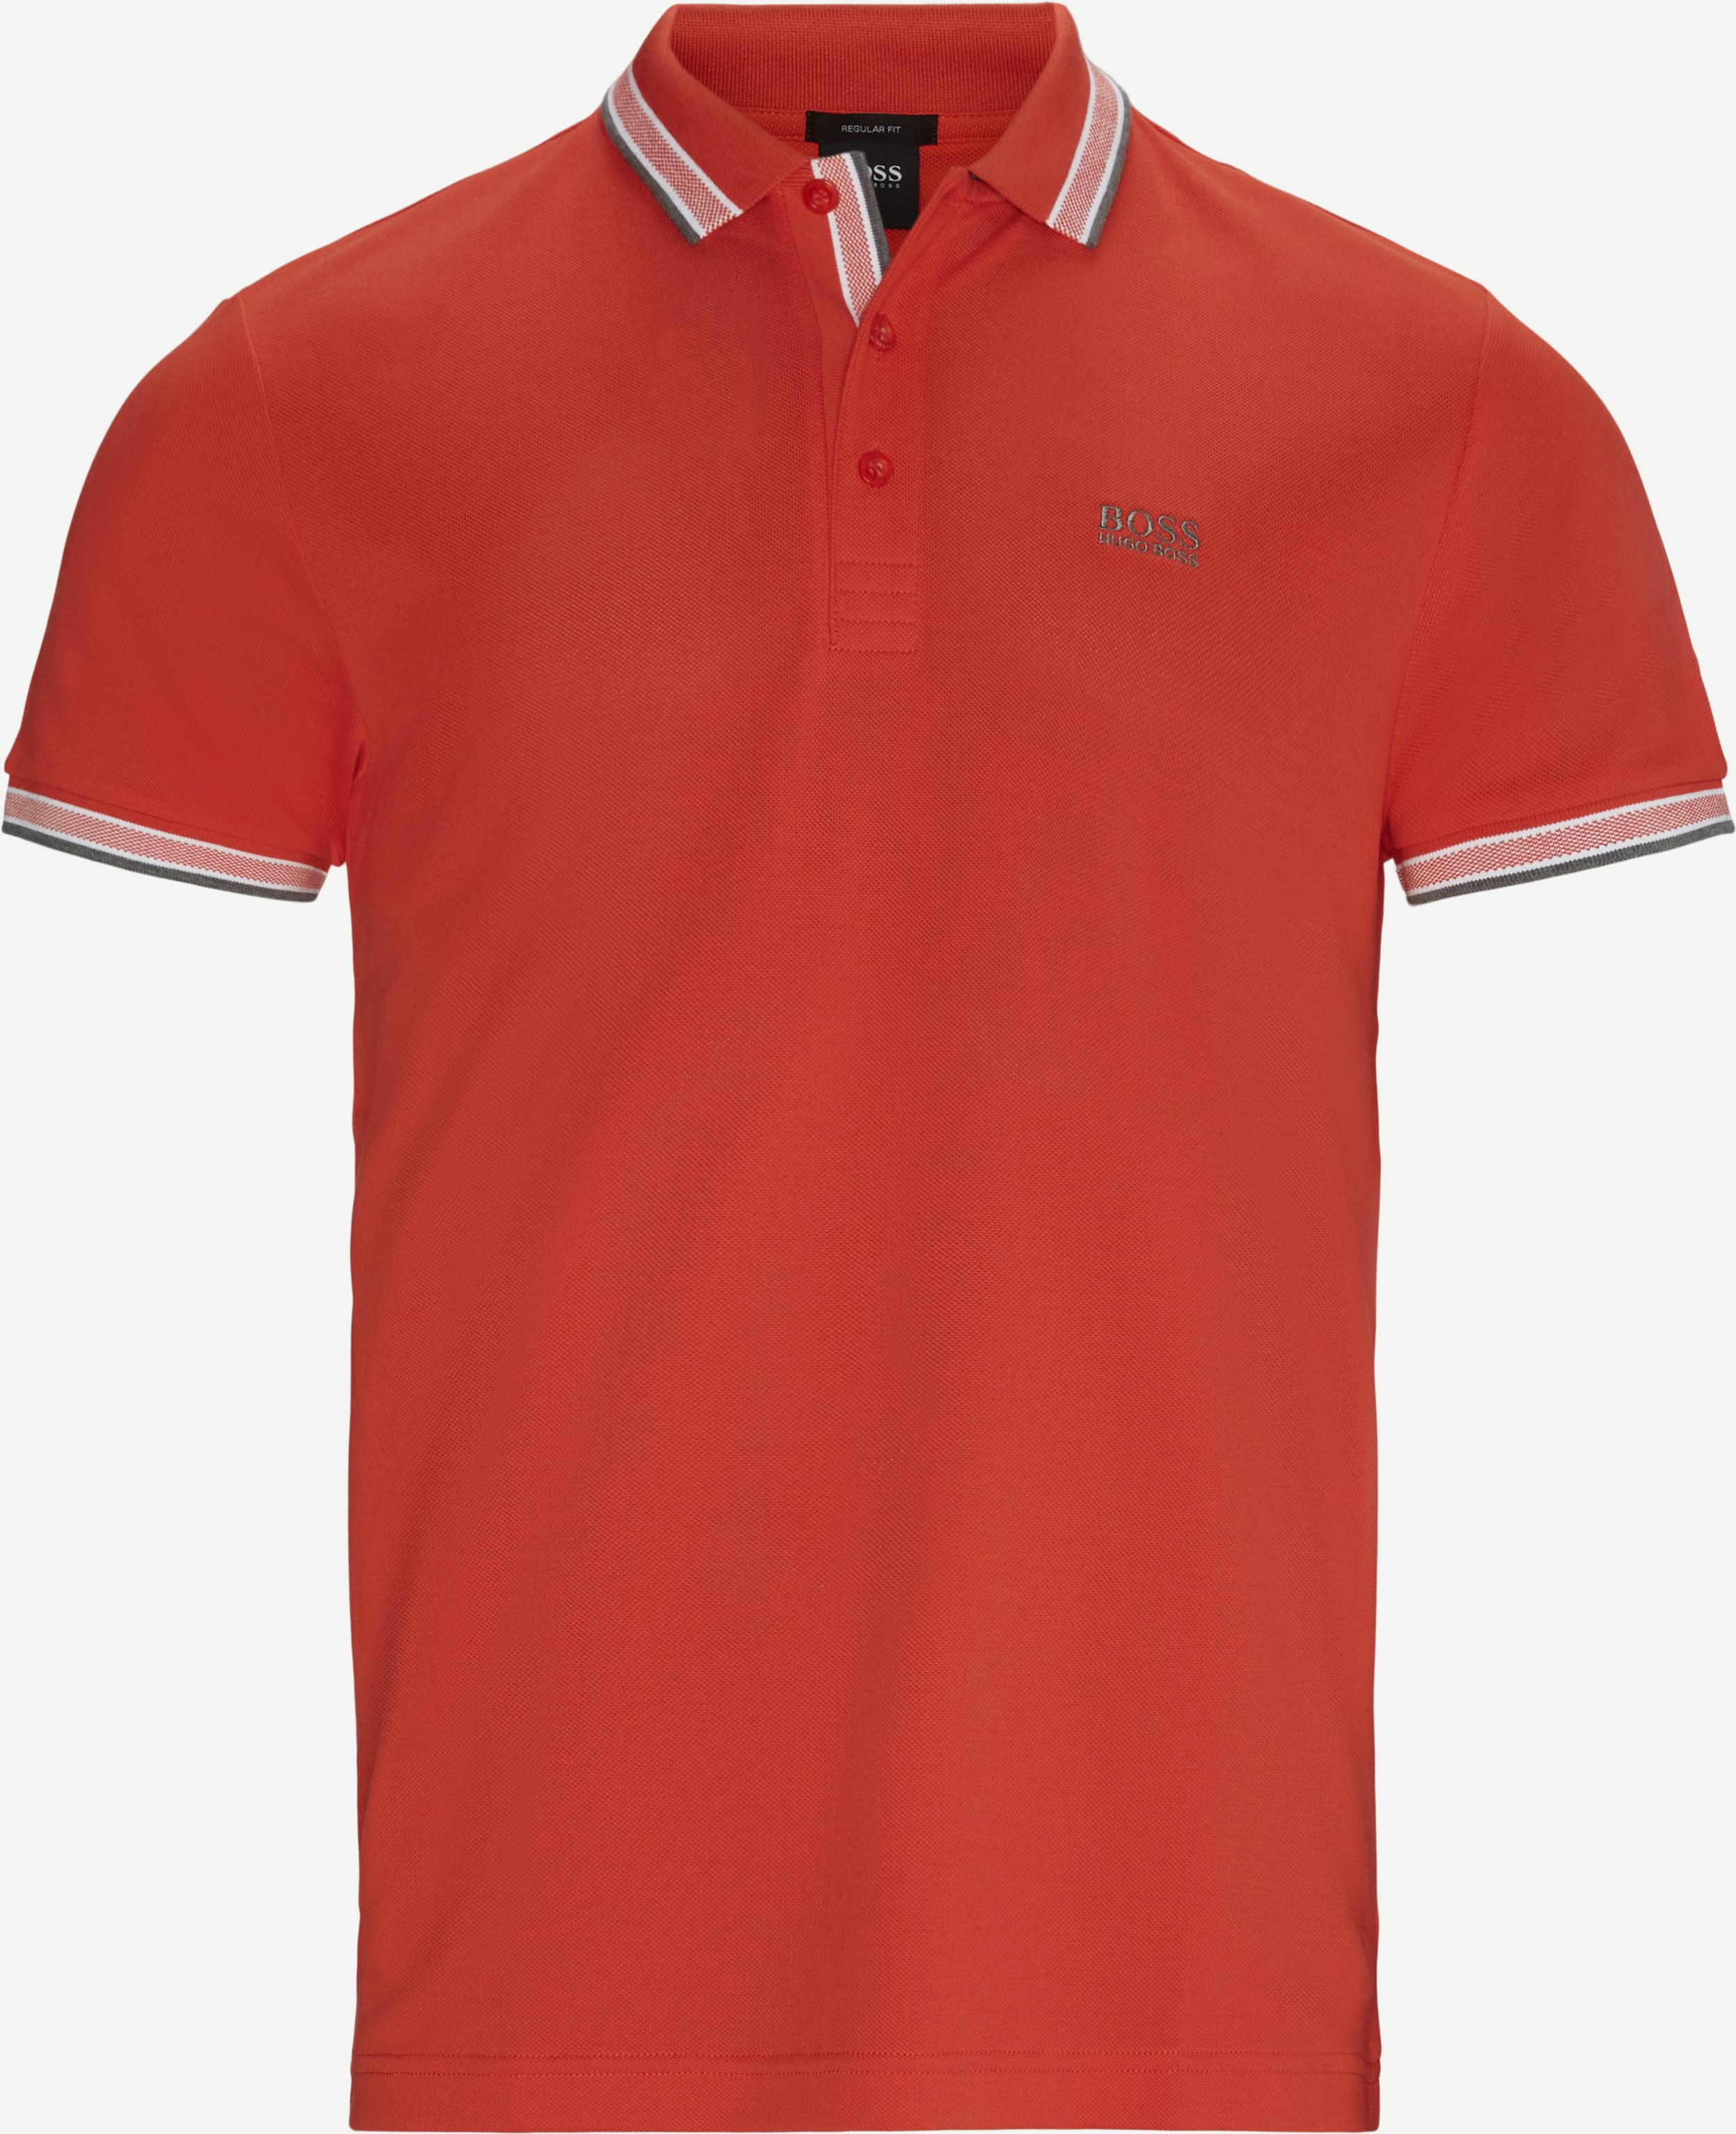 Paddy Polo T-shirt - T-shirts - Regular fit - Orange